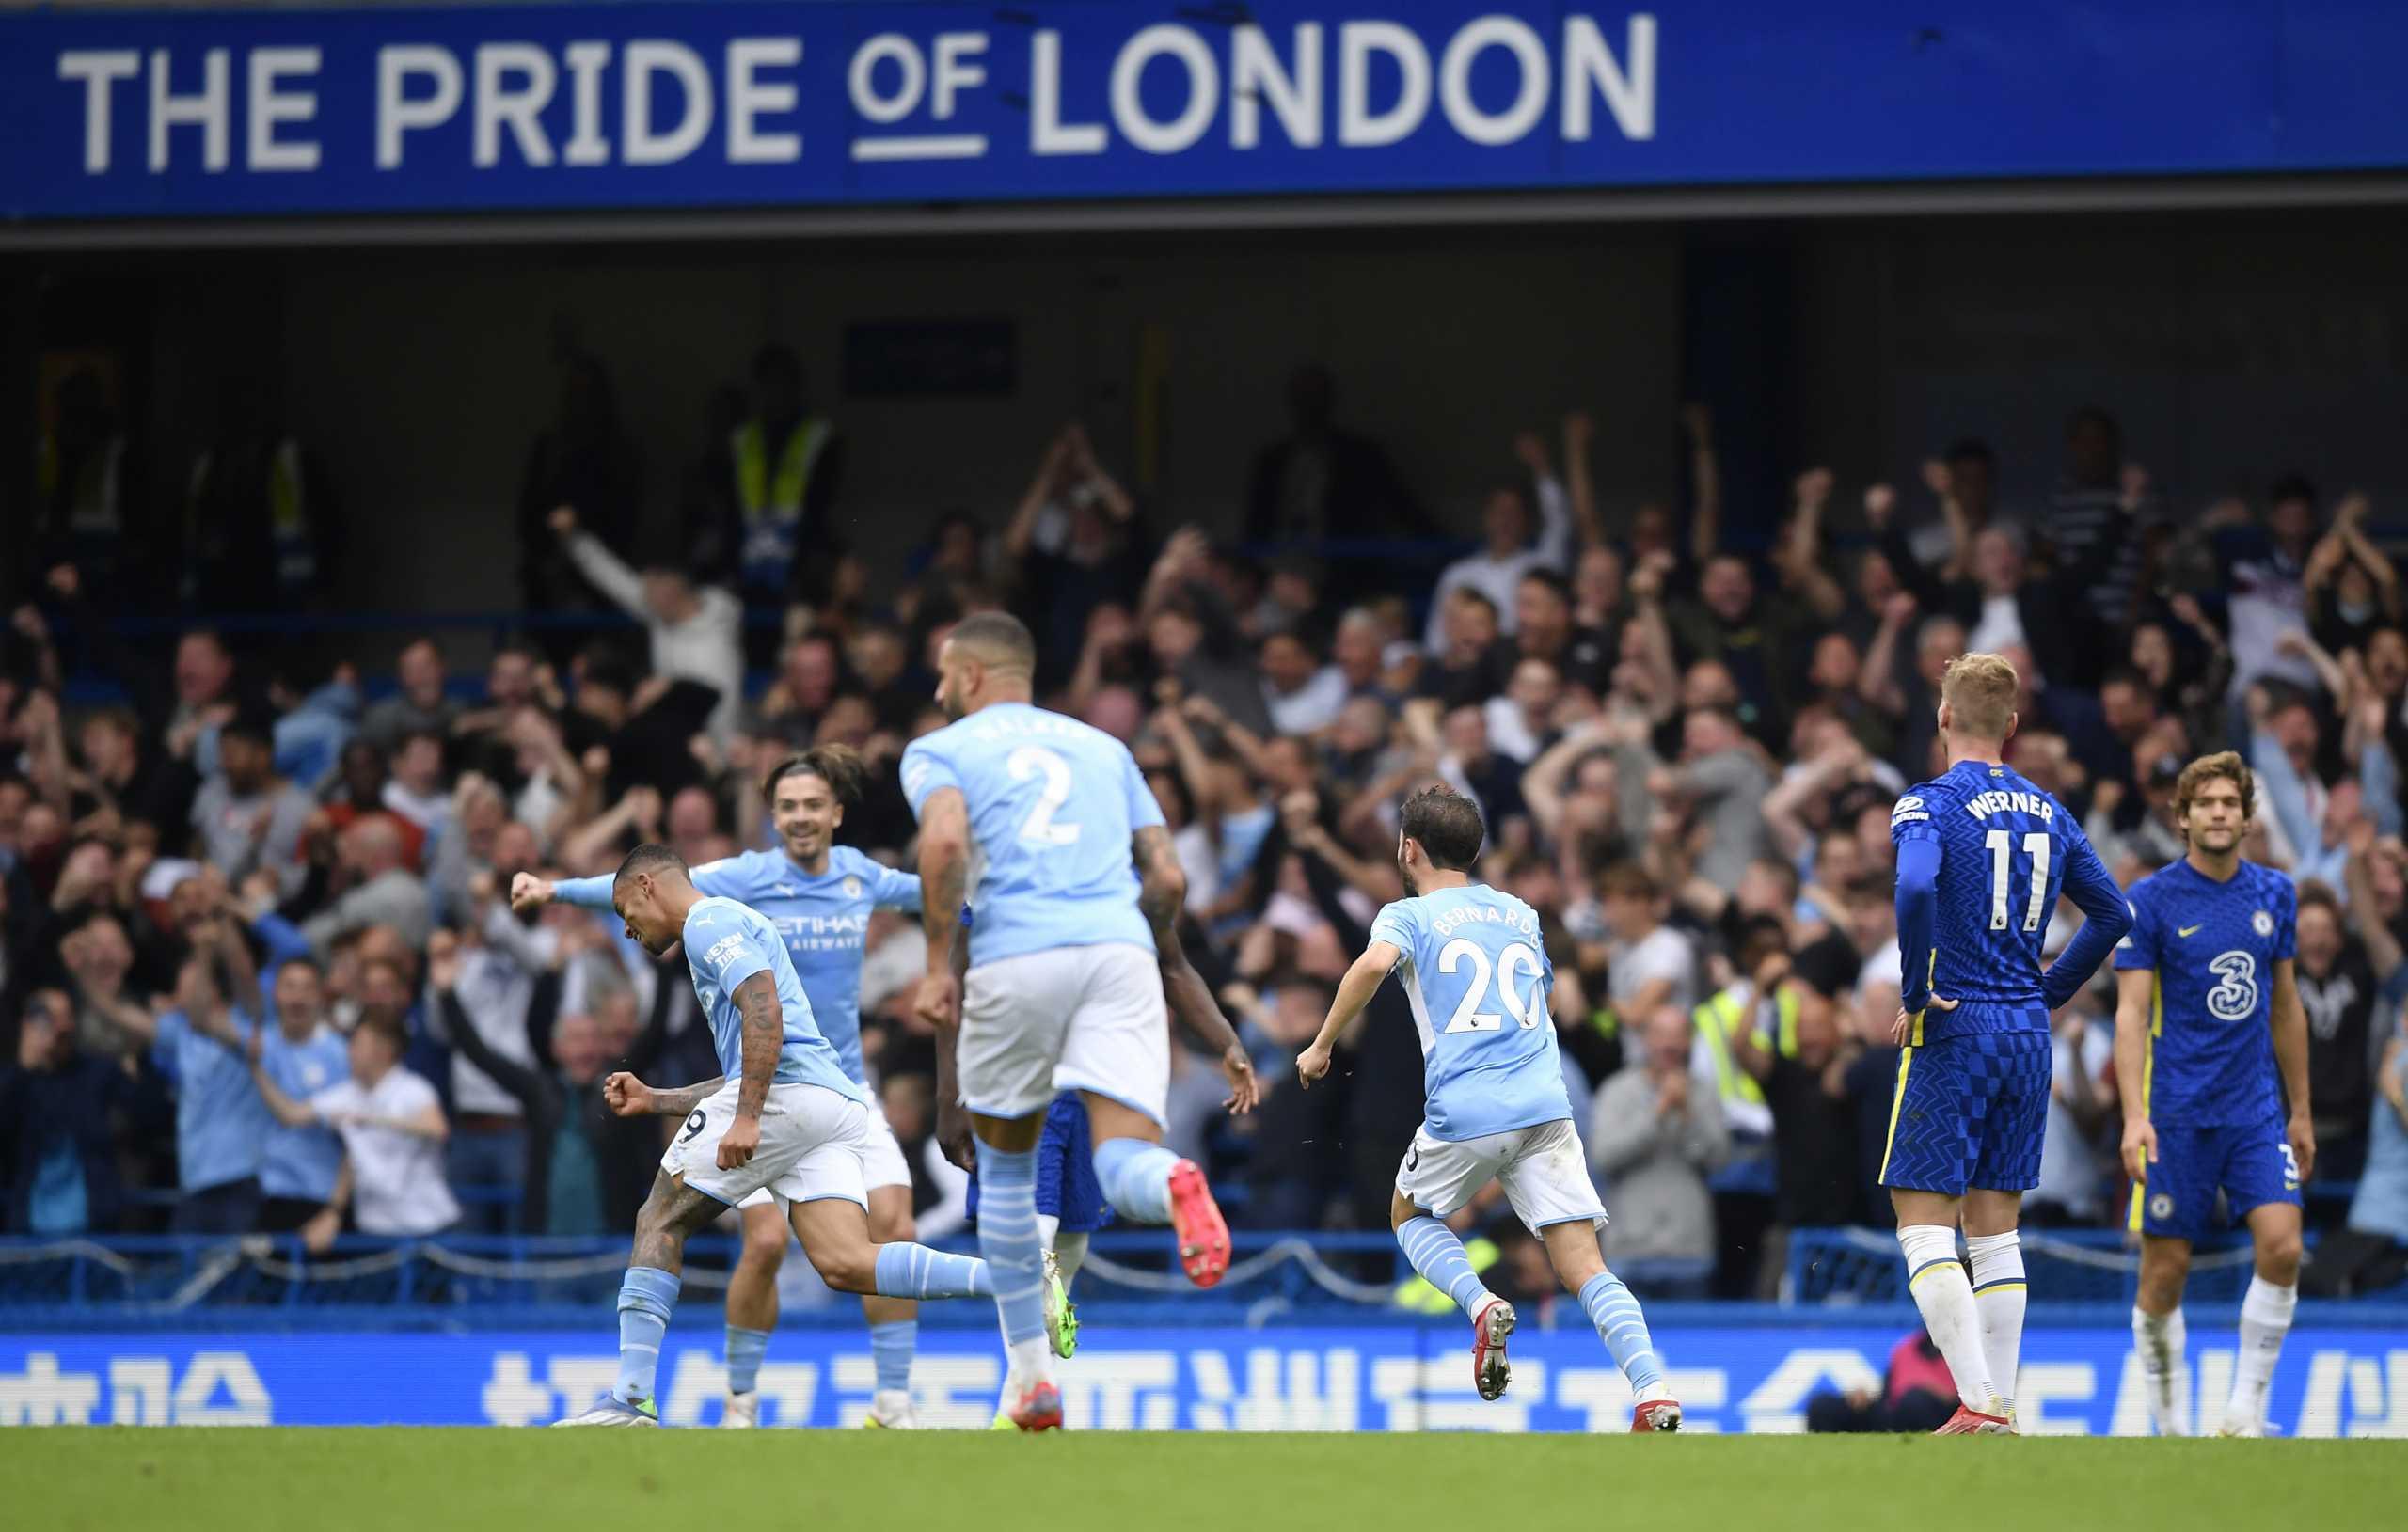 Premier League, Τσέλσι – Μάντσεστερ Σίτι 0-1: «Εκδίκηση» με νίκη στο Λονδίνο